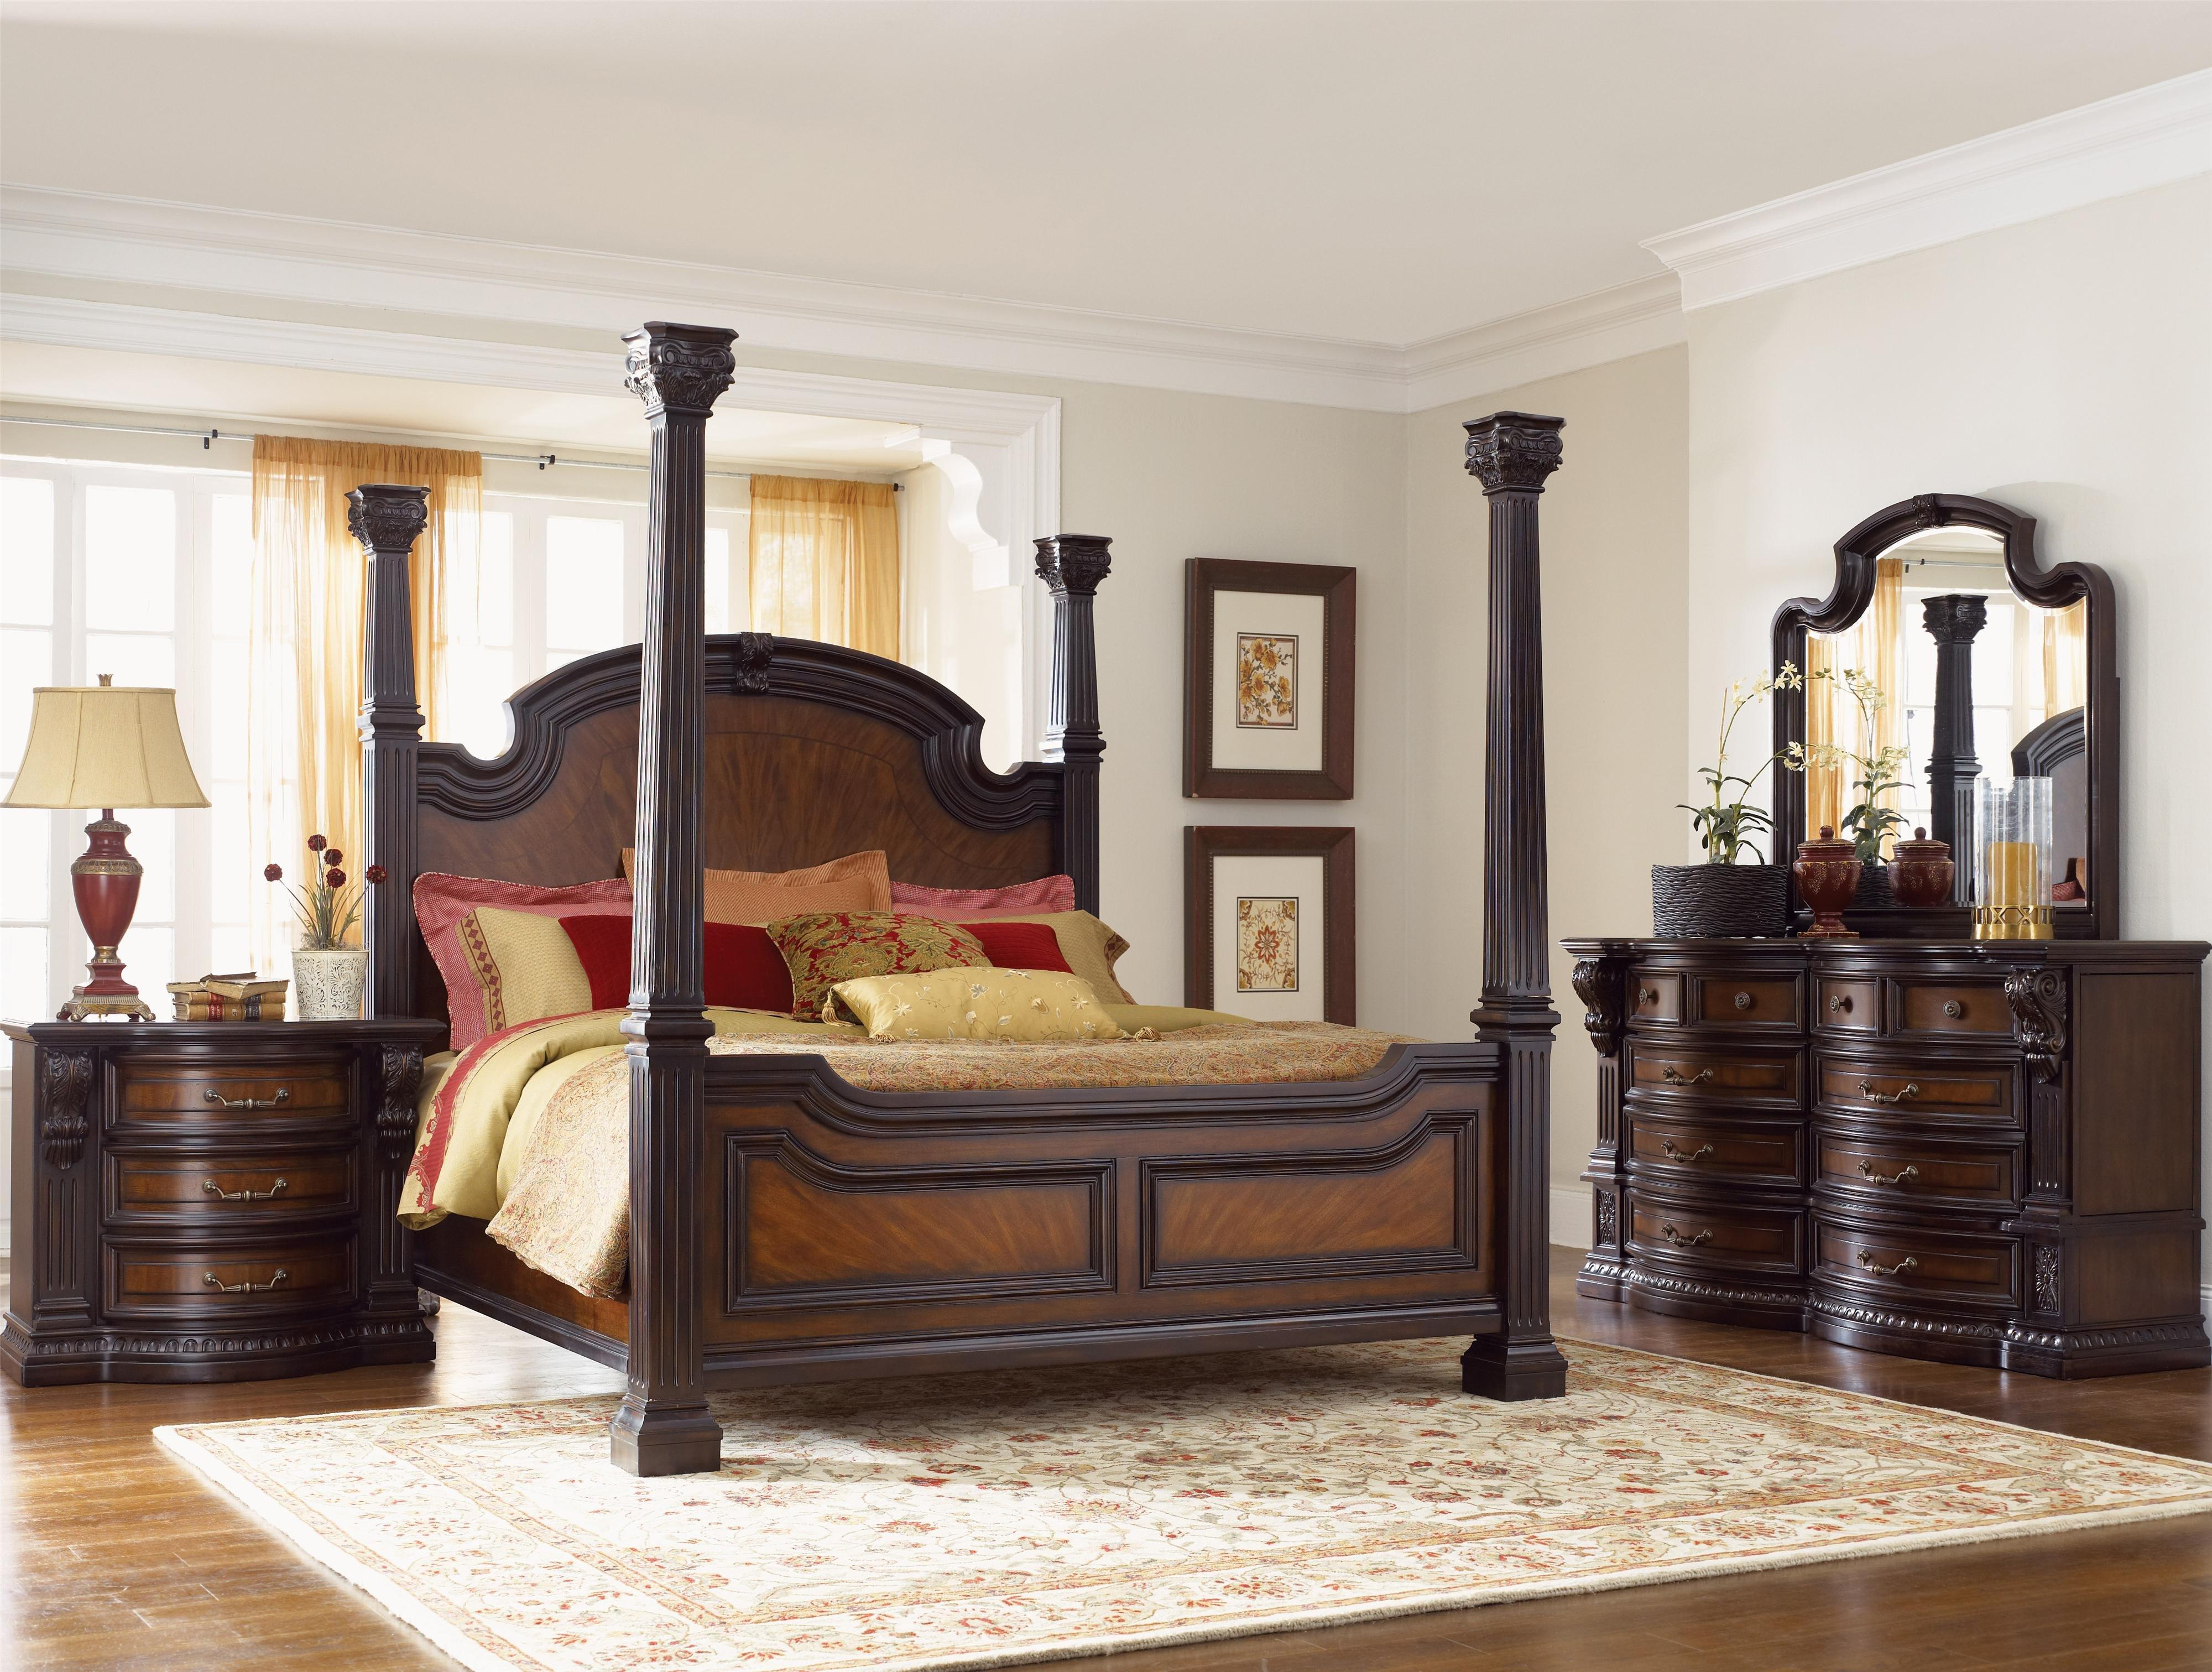 King Size Bedroom Set for Sale Inspirational Grand Estates 02 by Fairmont Designs Royal Furniture